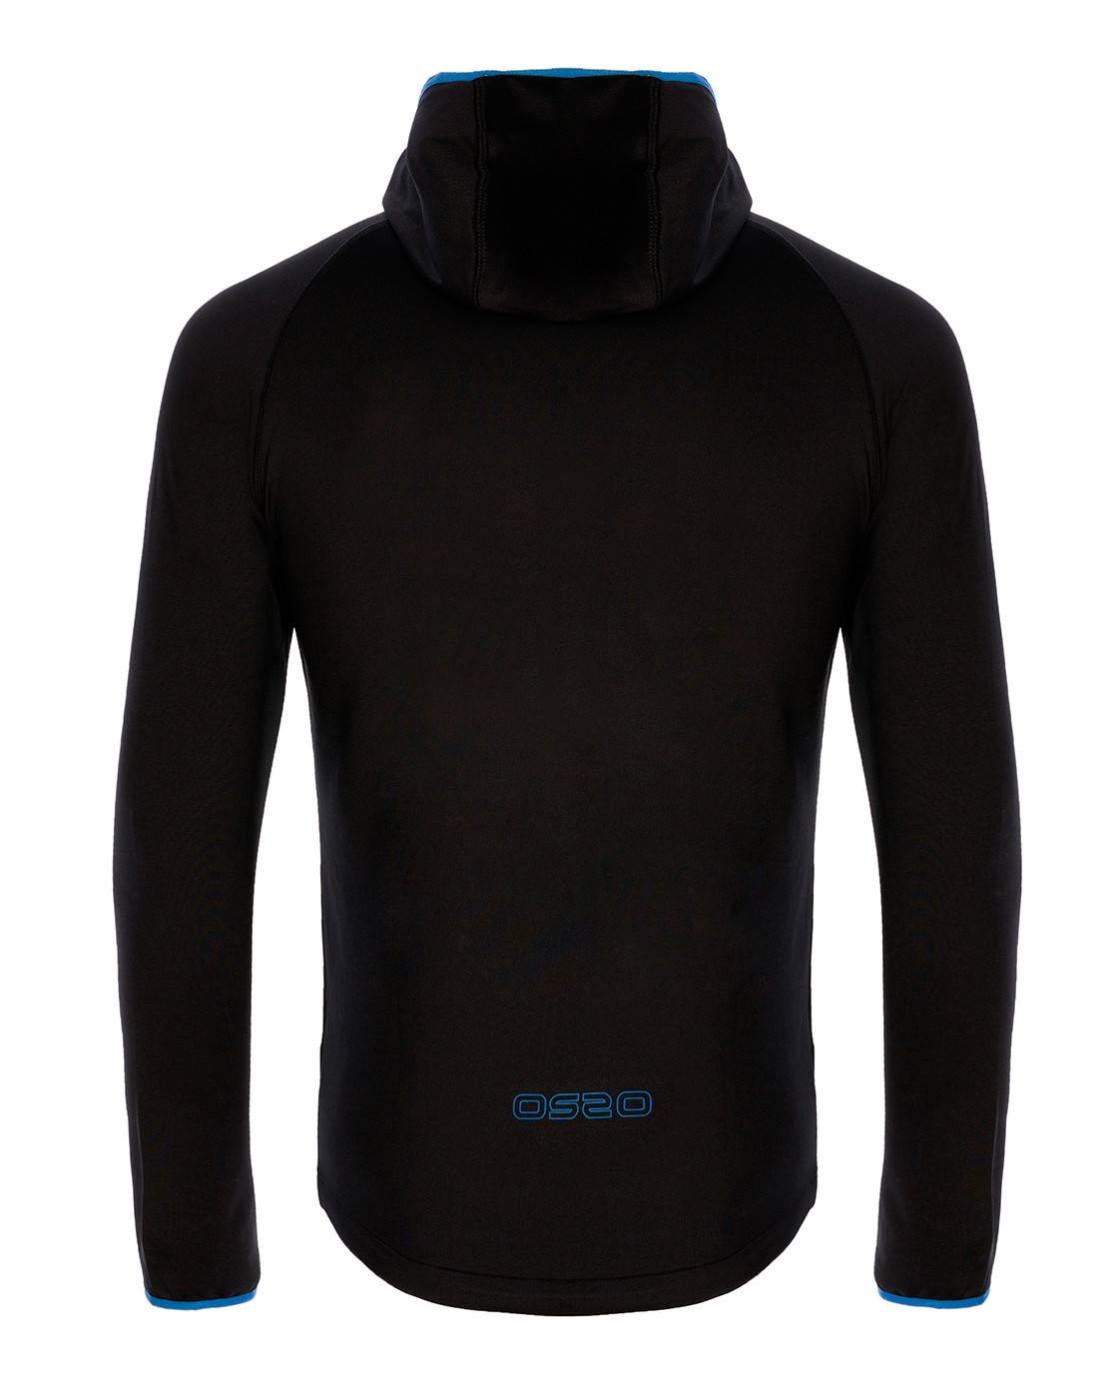 Ace Jacket Negra Posterior